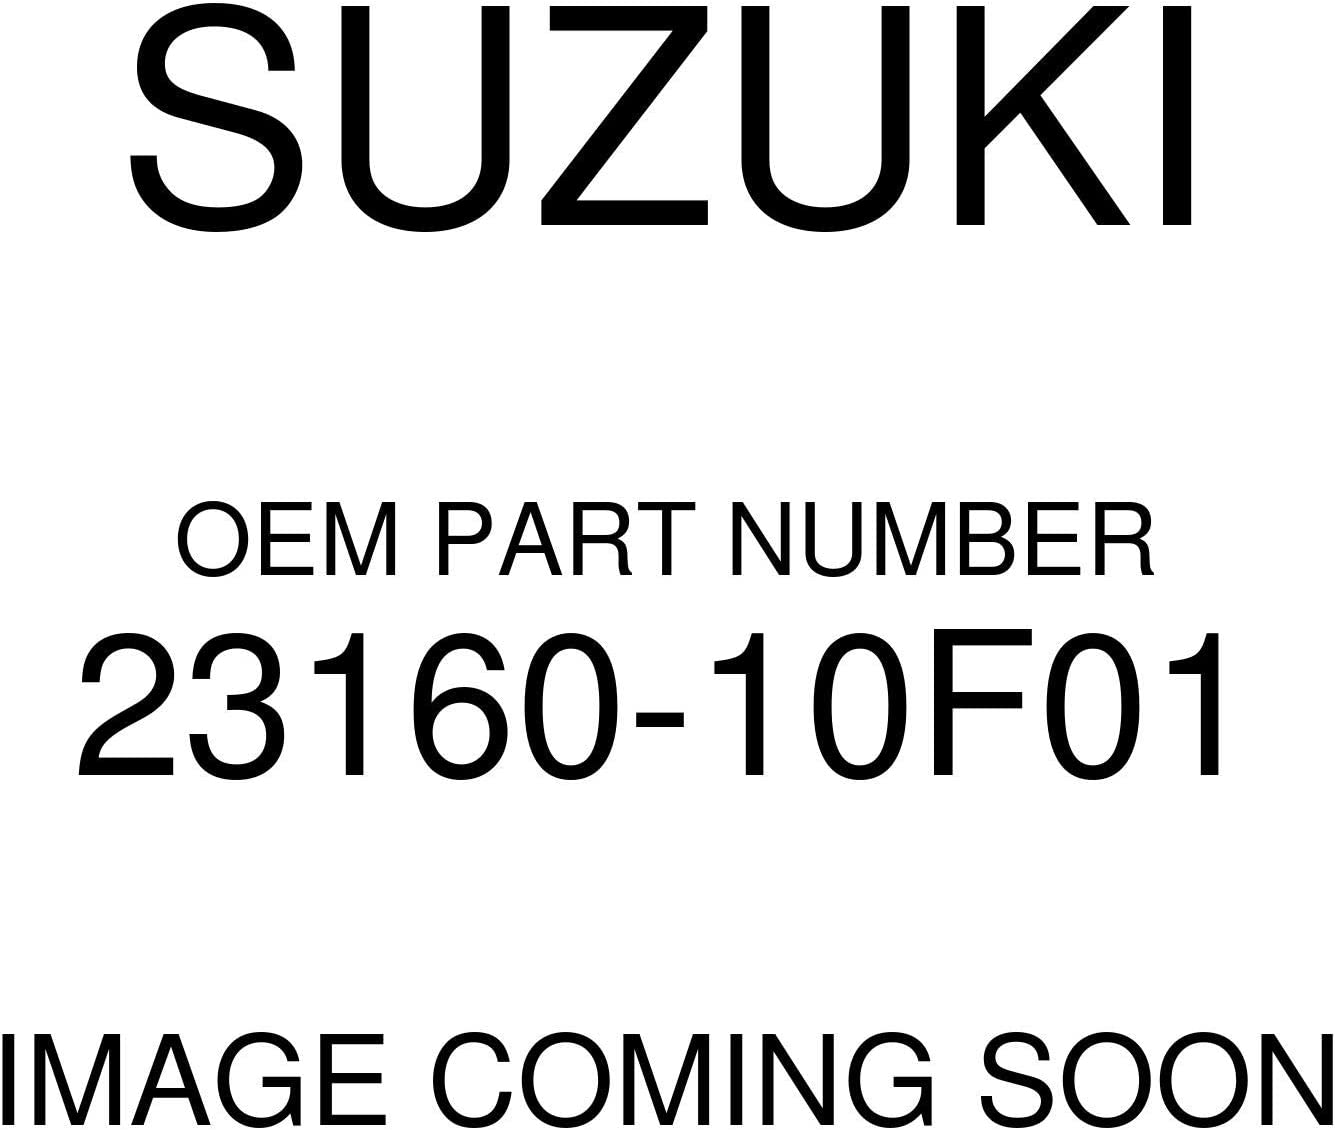 23160-10F01-000 Suzuki Cylinder Boston Mall 2316010F01000 clutch release Time sale